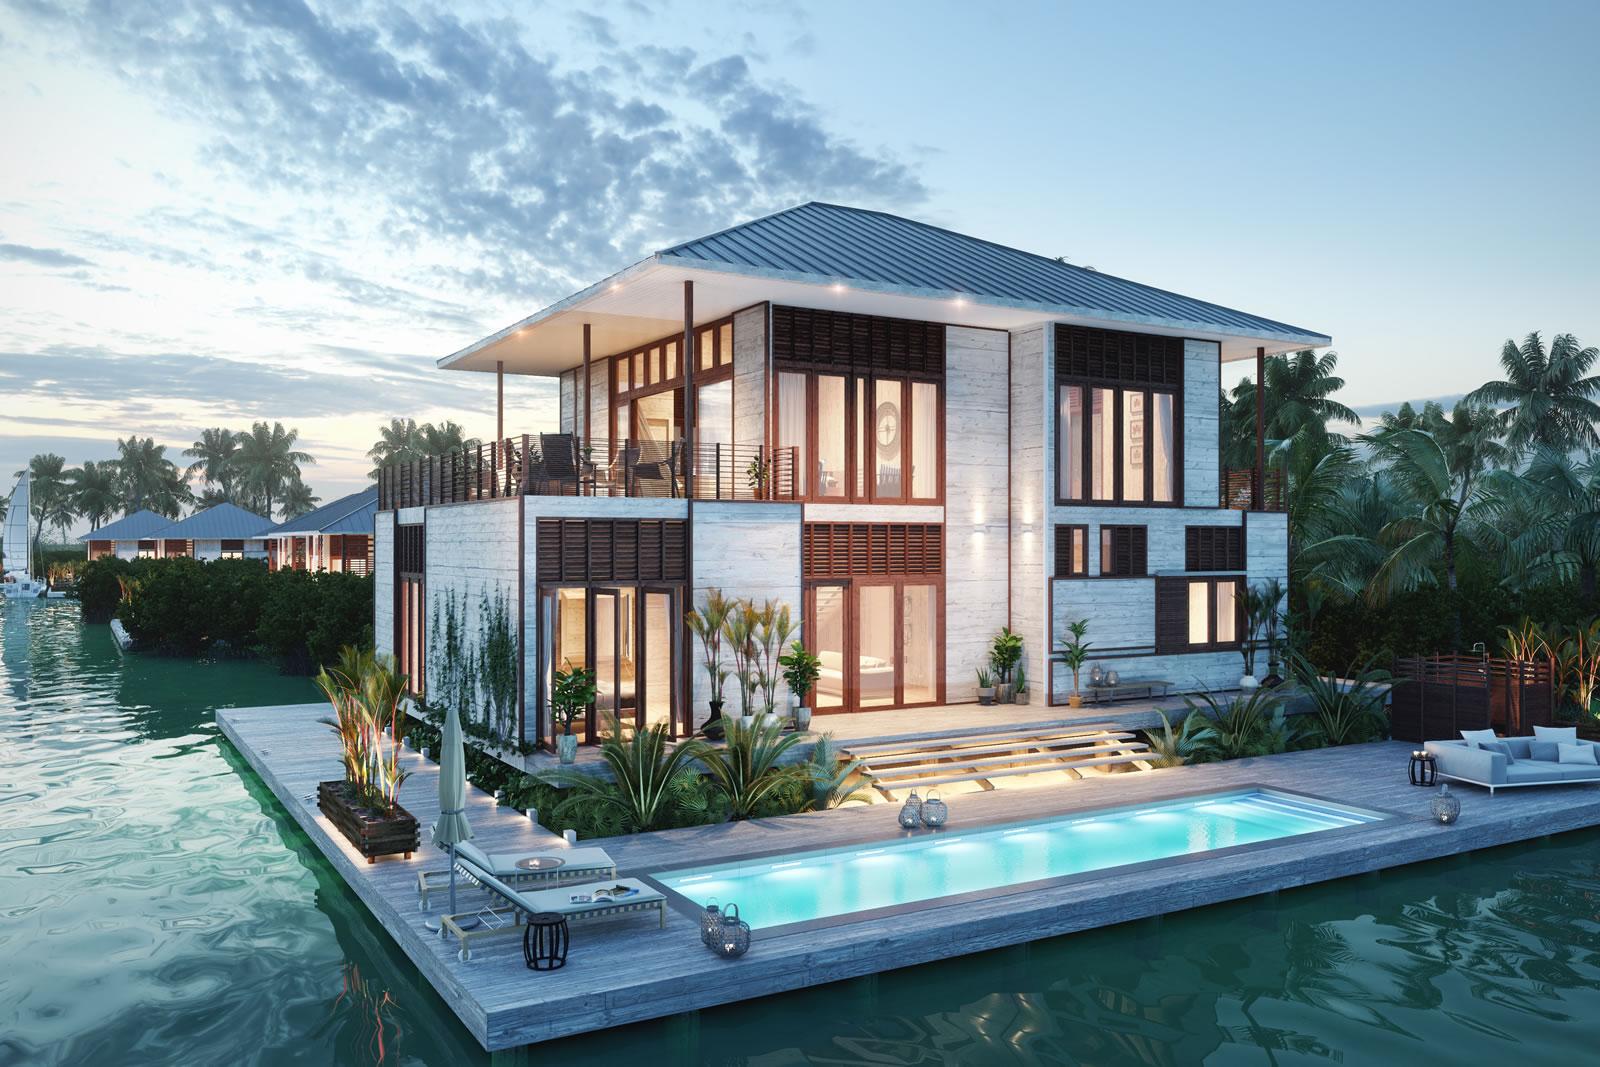 Buy Beachfront Property In Belize